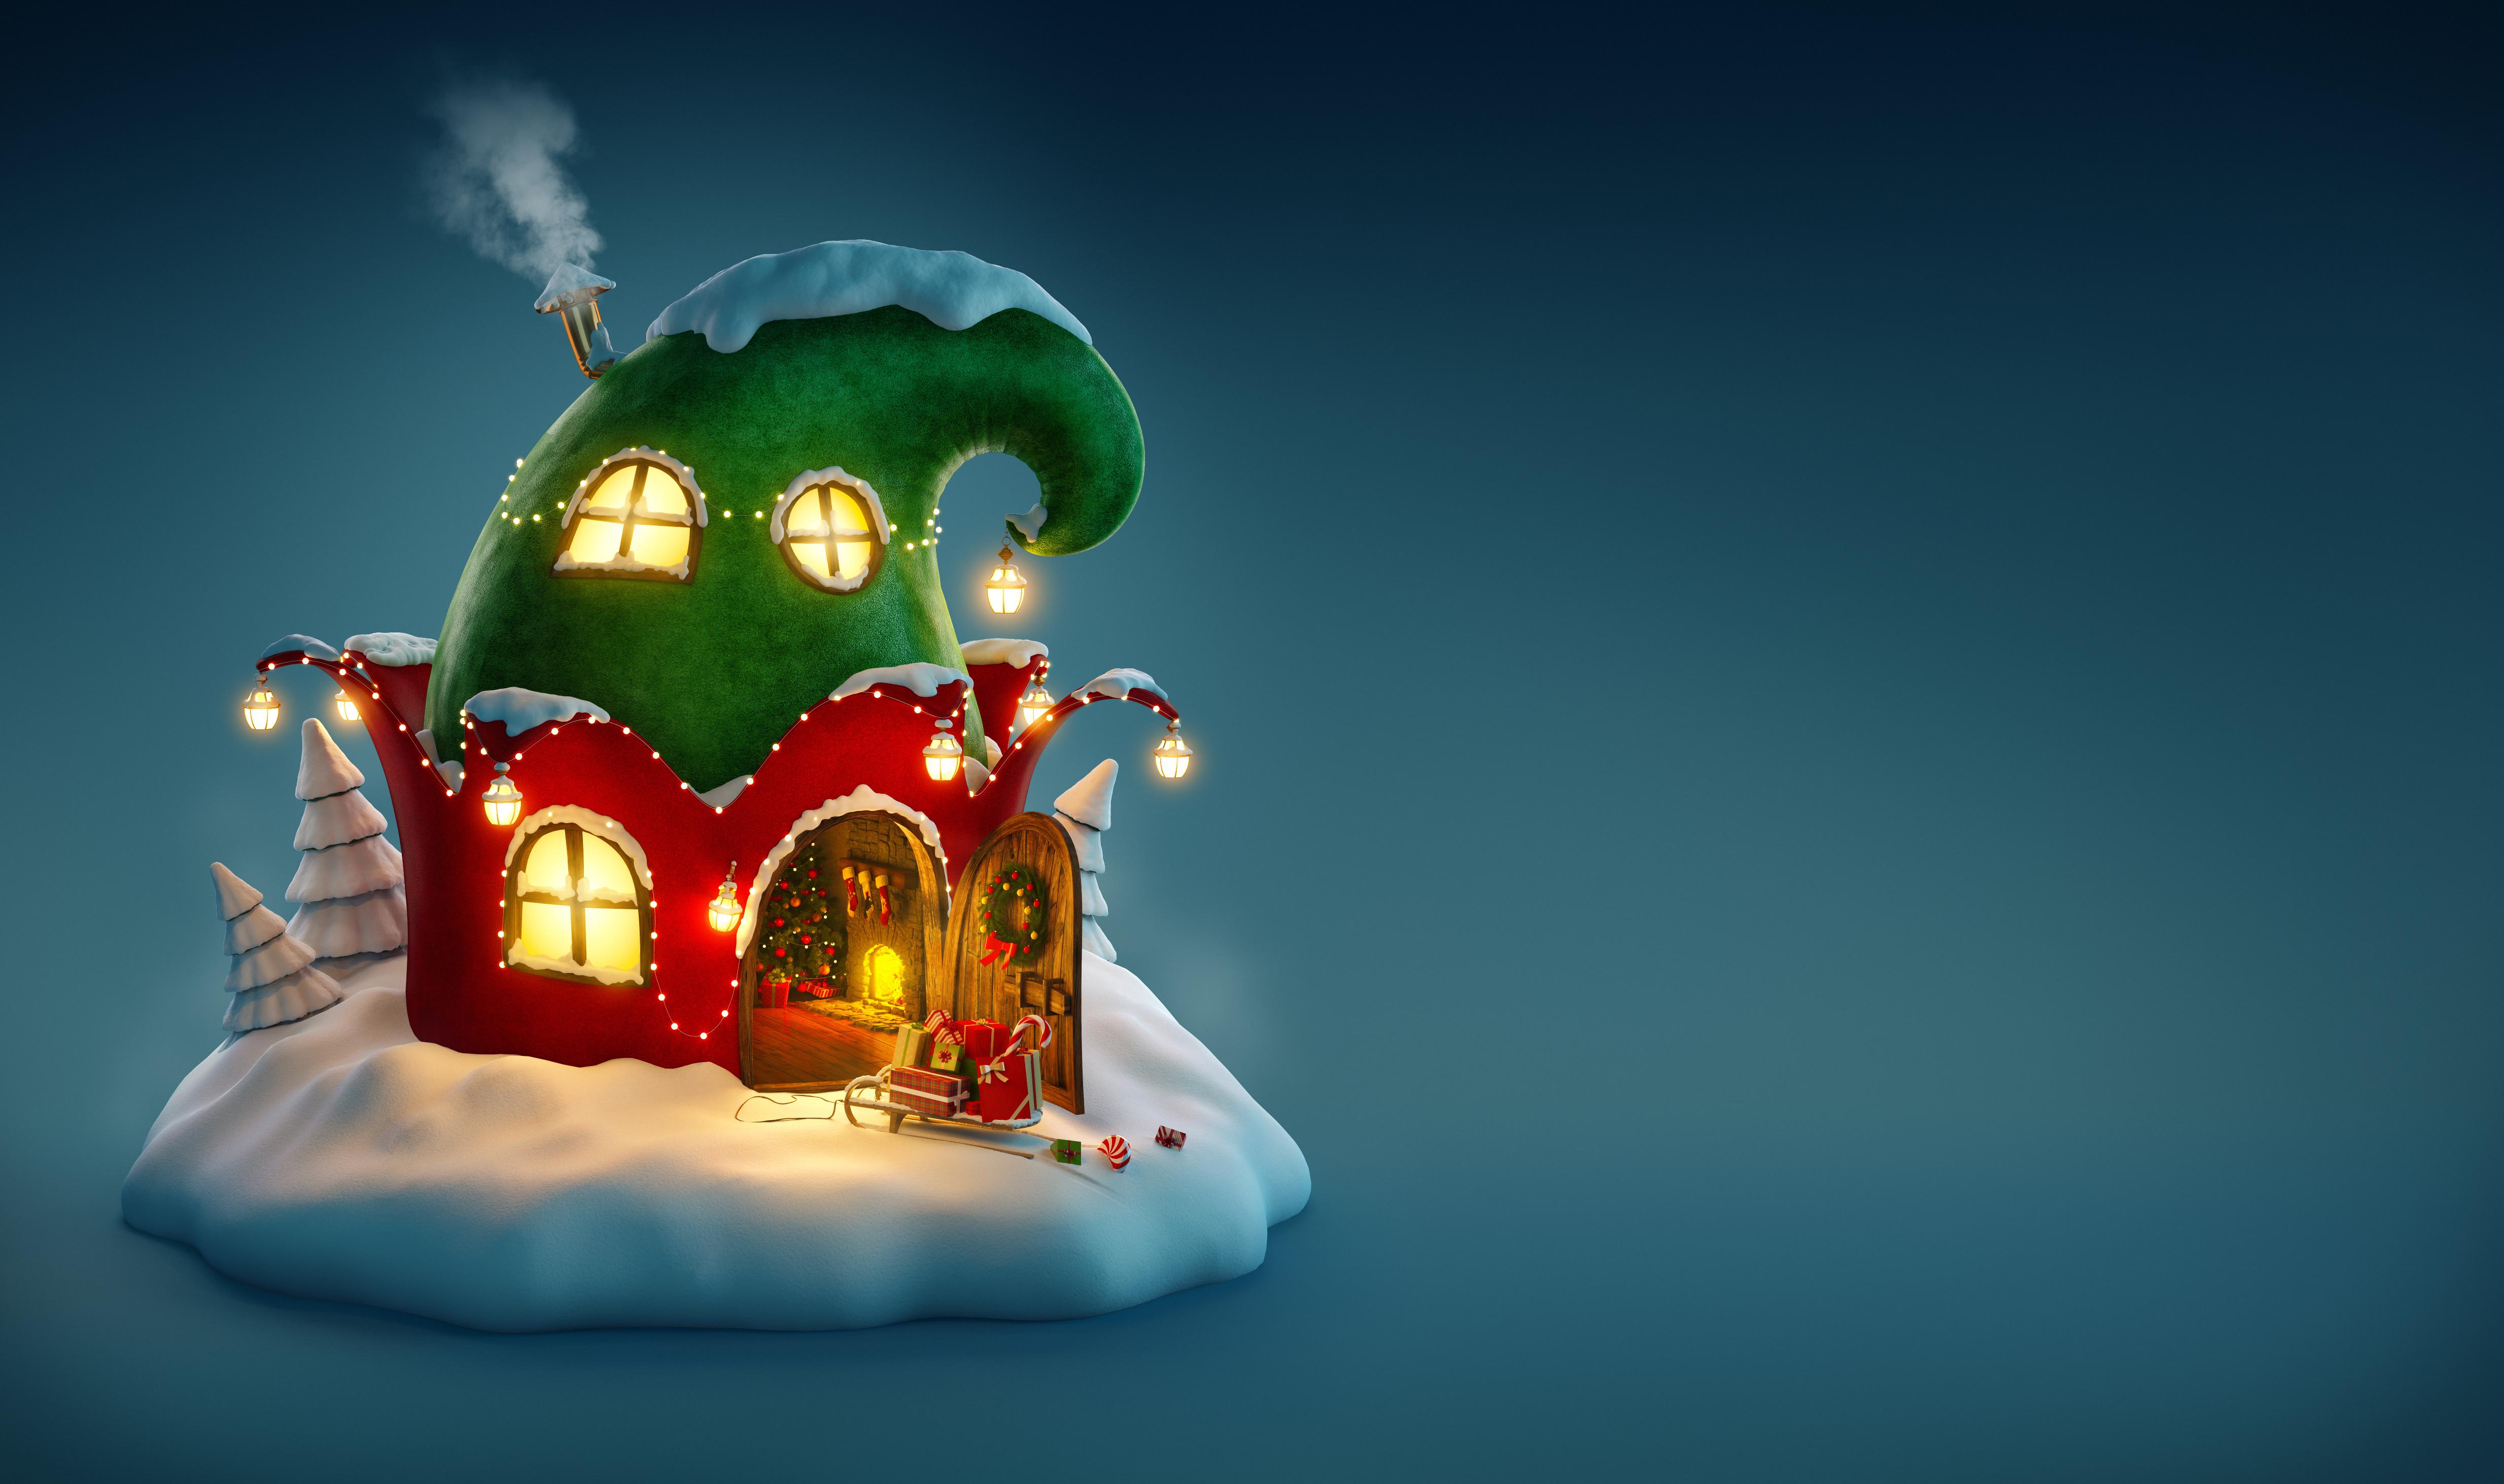 Christmas Fairy House 4k, HD Celebrations, 4k Wallpapers ...